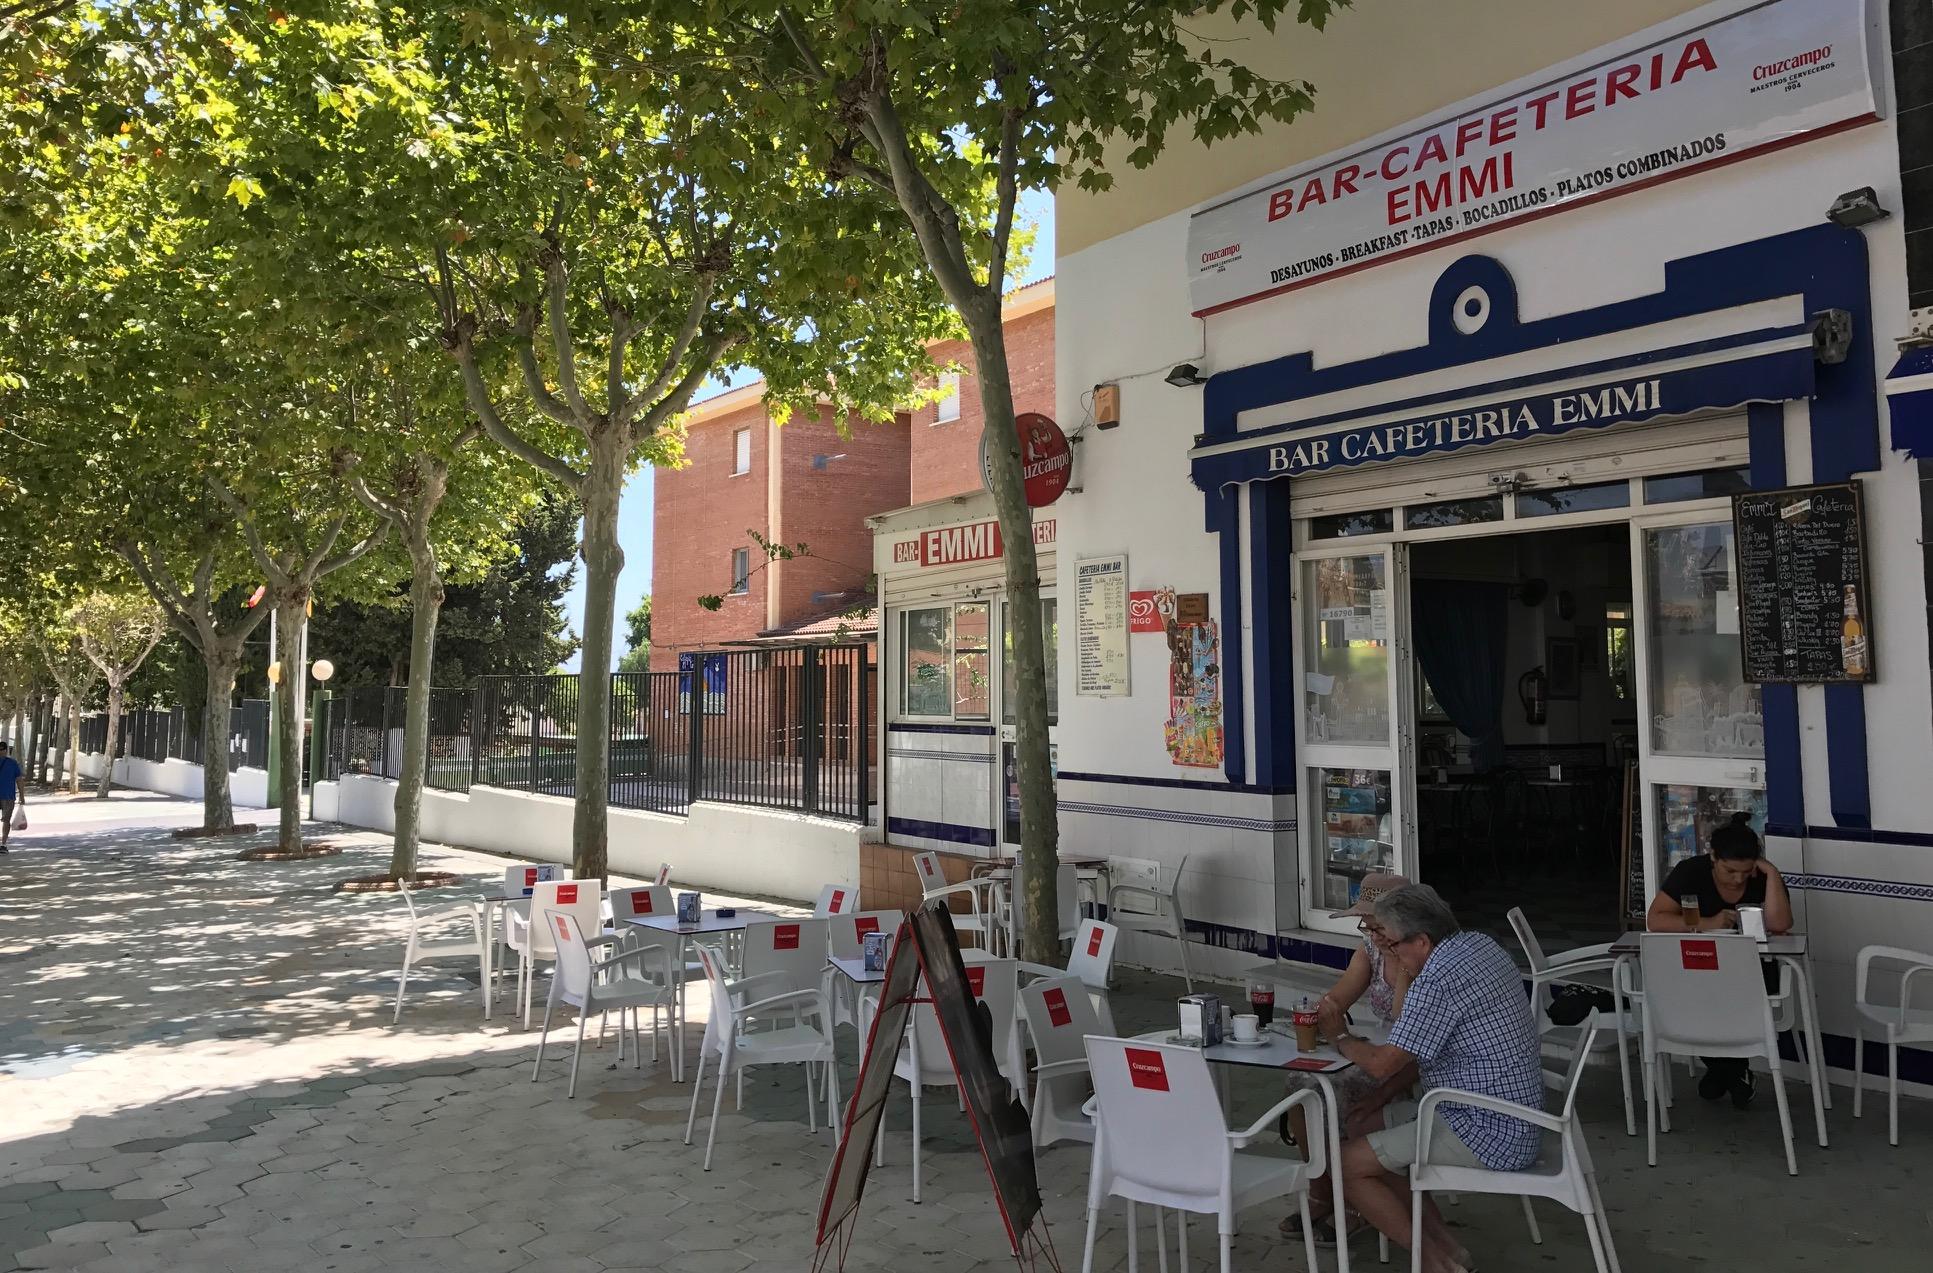 benalmadena - Business in Málaga, a good opportunity